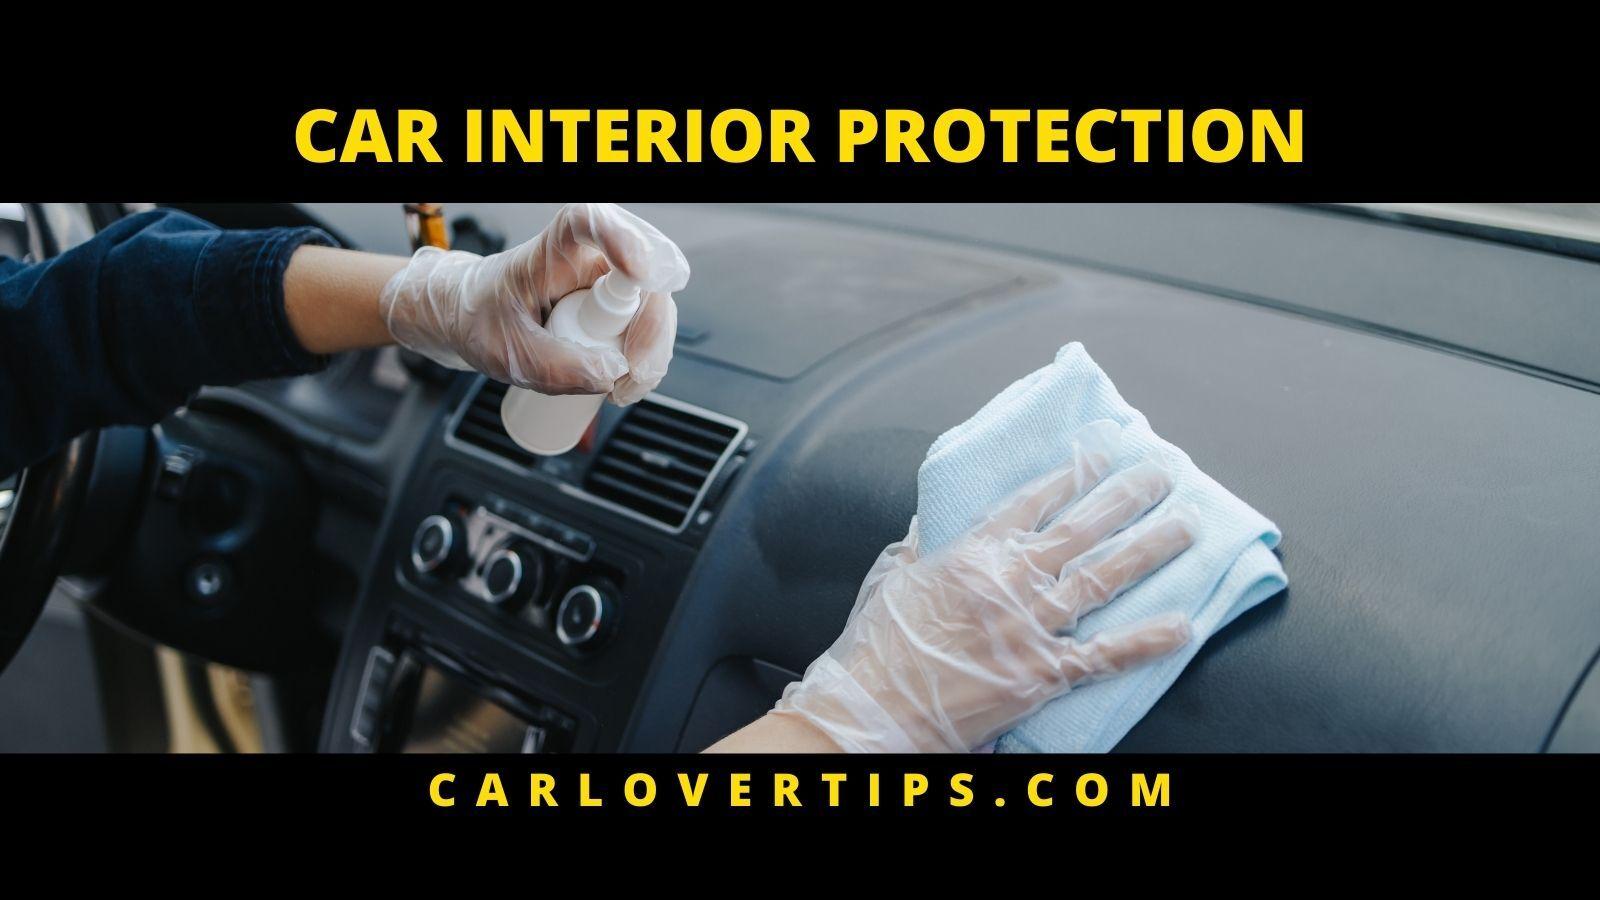 Car Interior Protection Coating Tips Car Lover Tips CAR